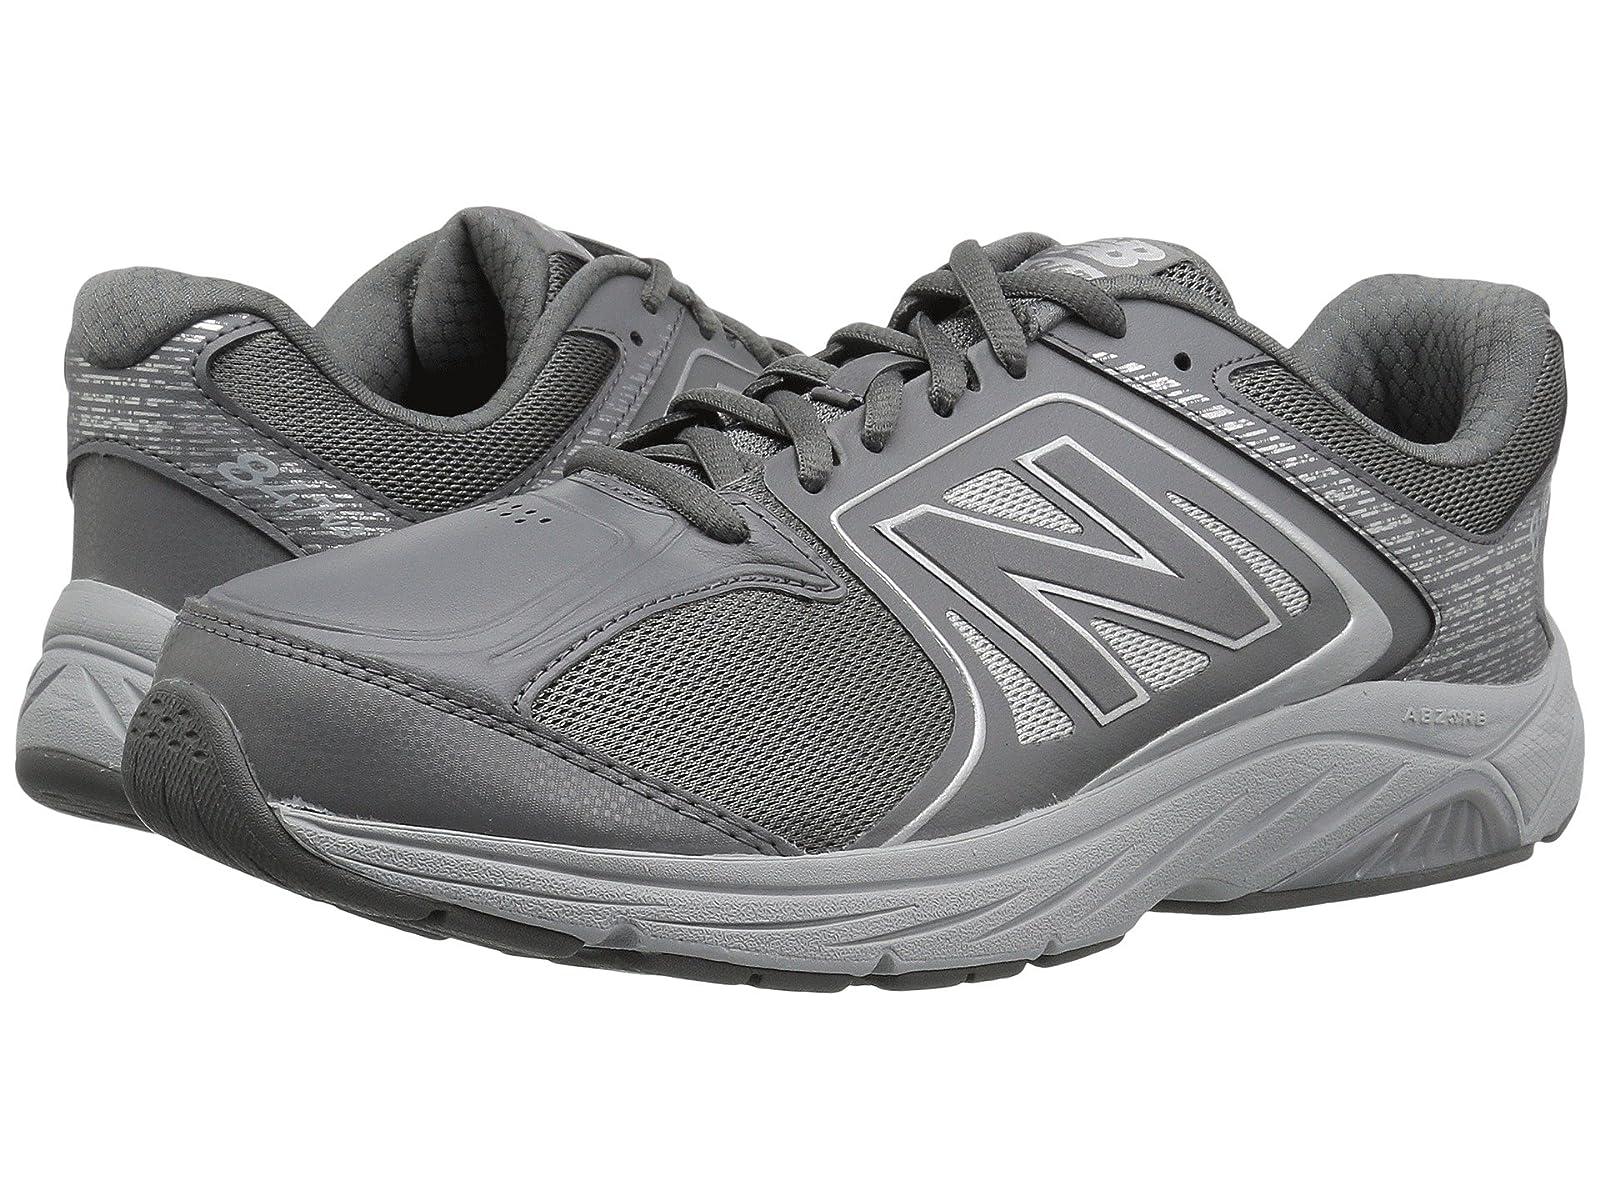 New Balance 847v3Atmospheric grades have affordable shoes